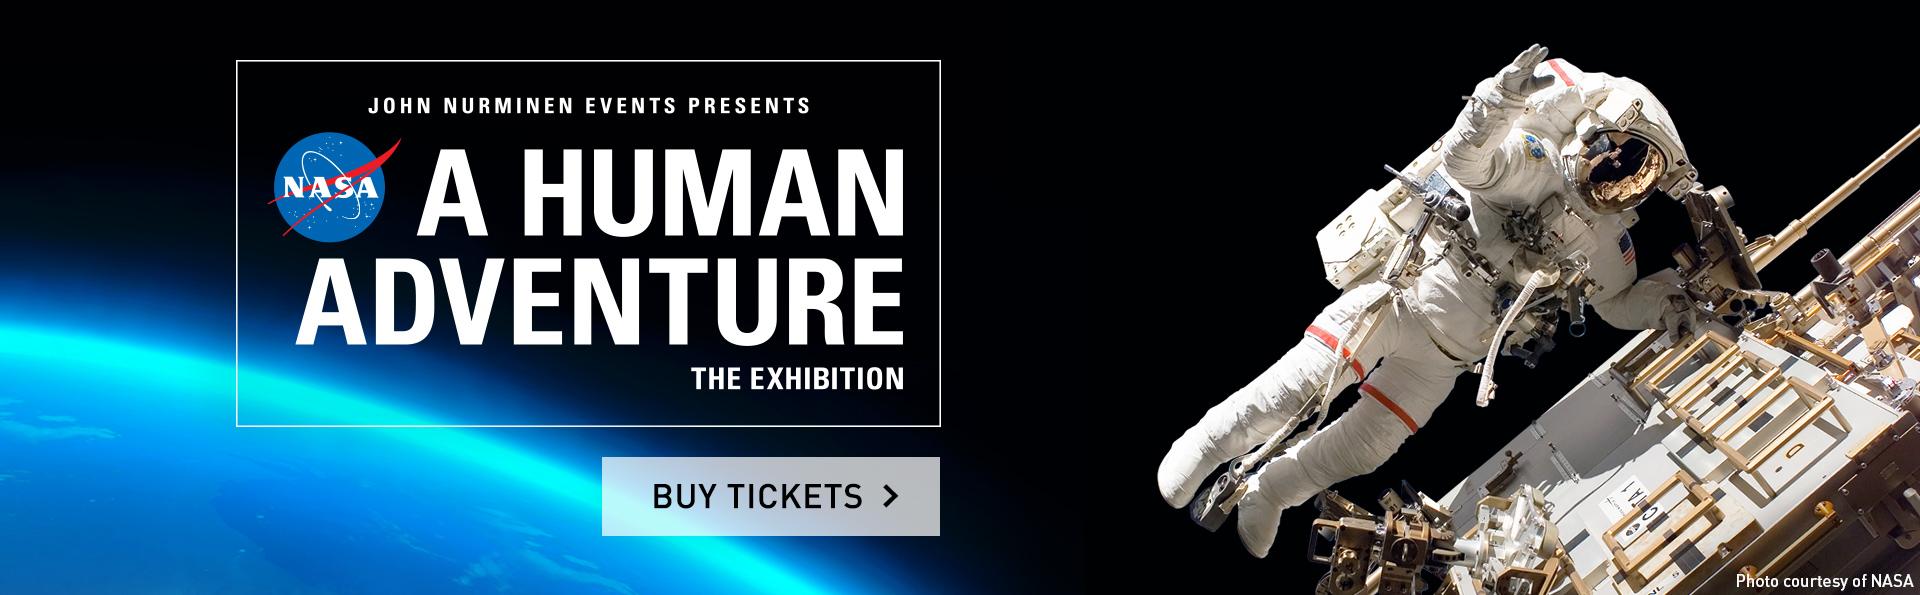 NASA A Human Adventure - Nasa museums in usa